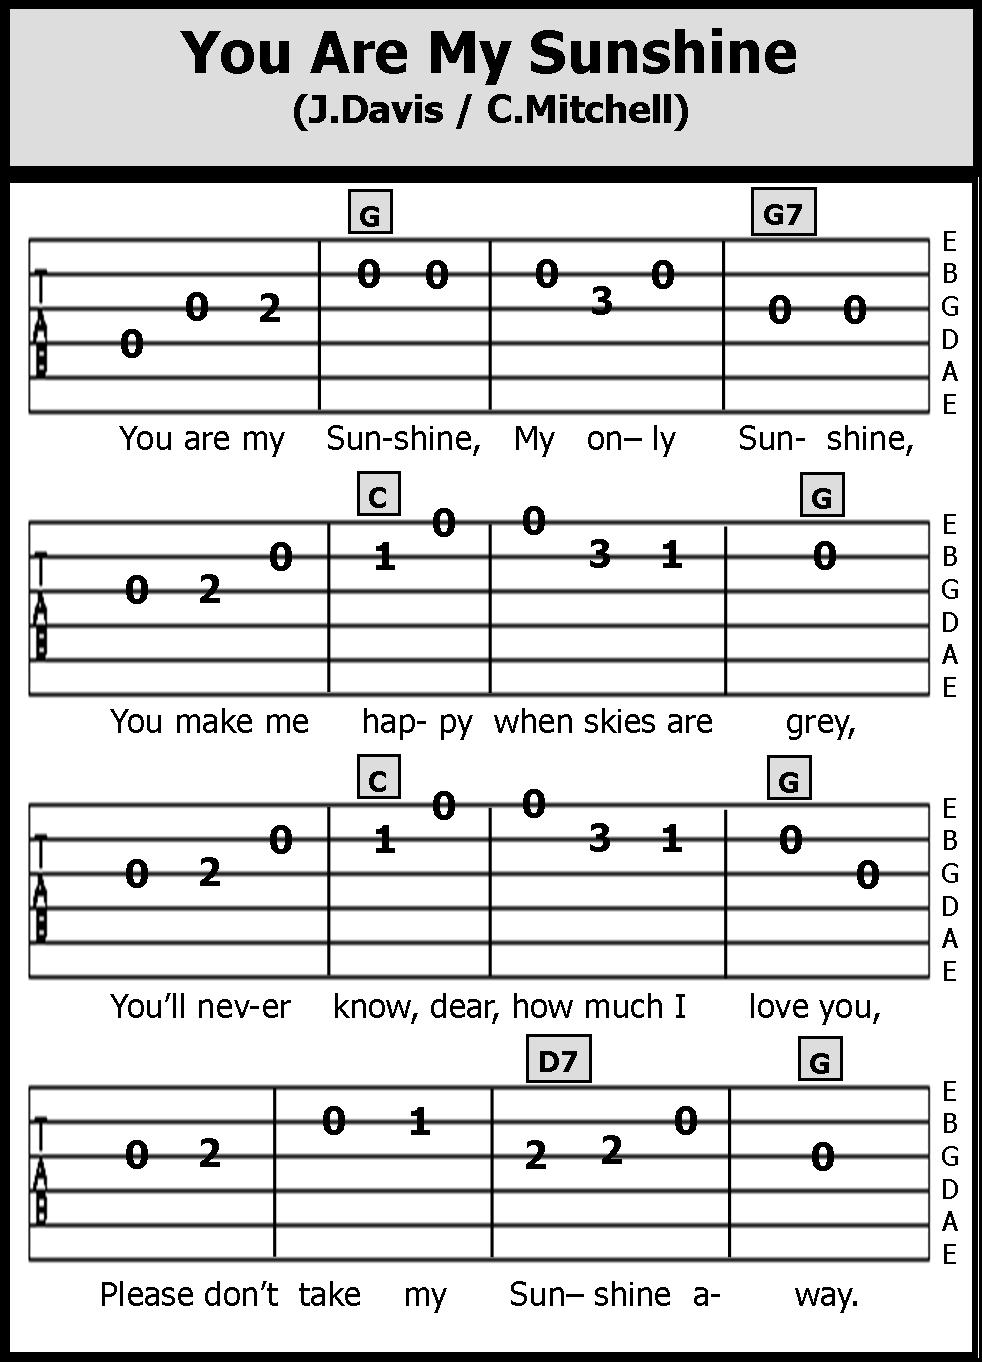 How To Play You Are My Sunshine On Guitar : sunshine, guitar, Guitar, Songs:, Sunshin, #guitar, Sunshine, Songs,, Ukulele, Fingerpicking, Chords, Songs